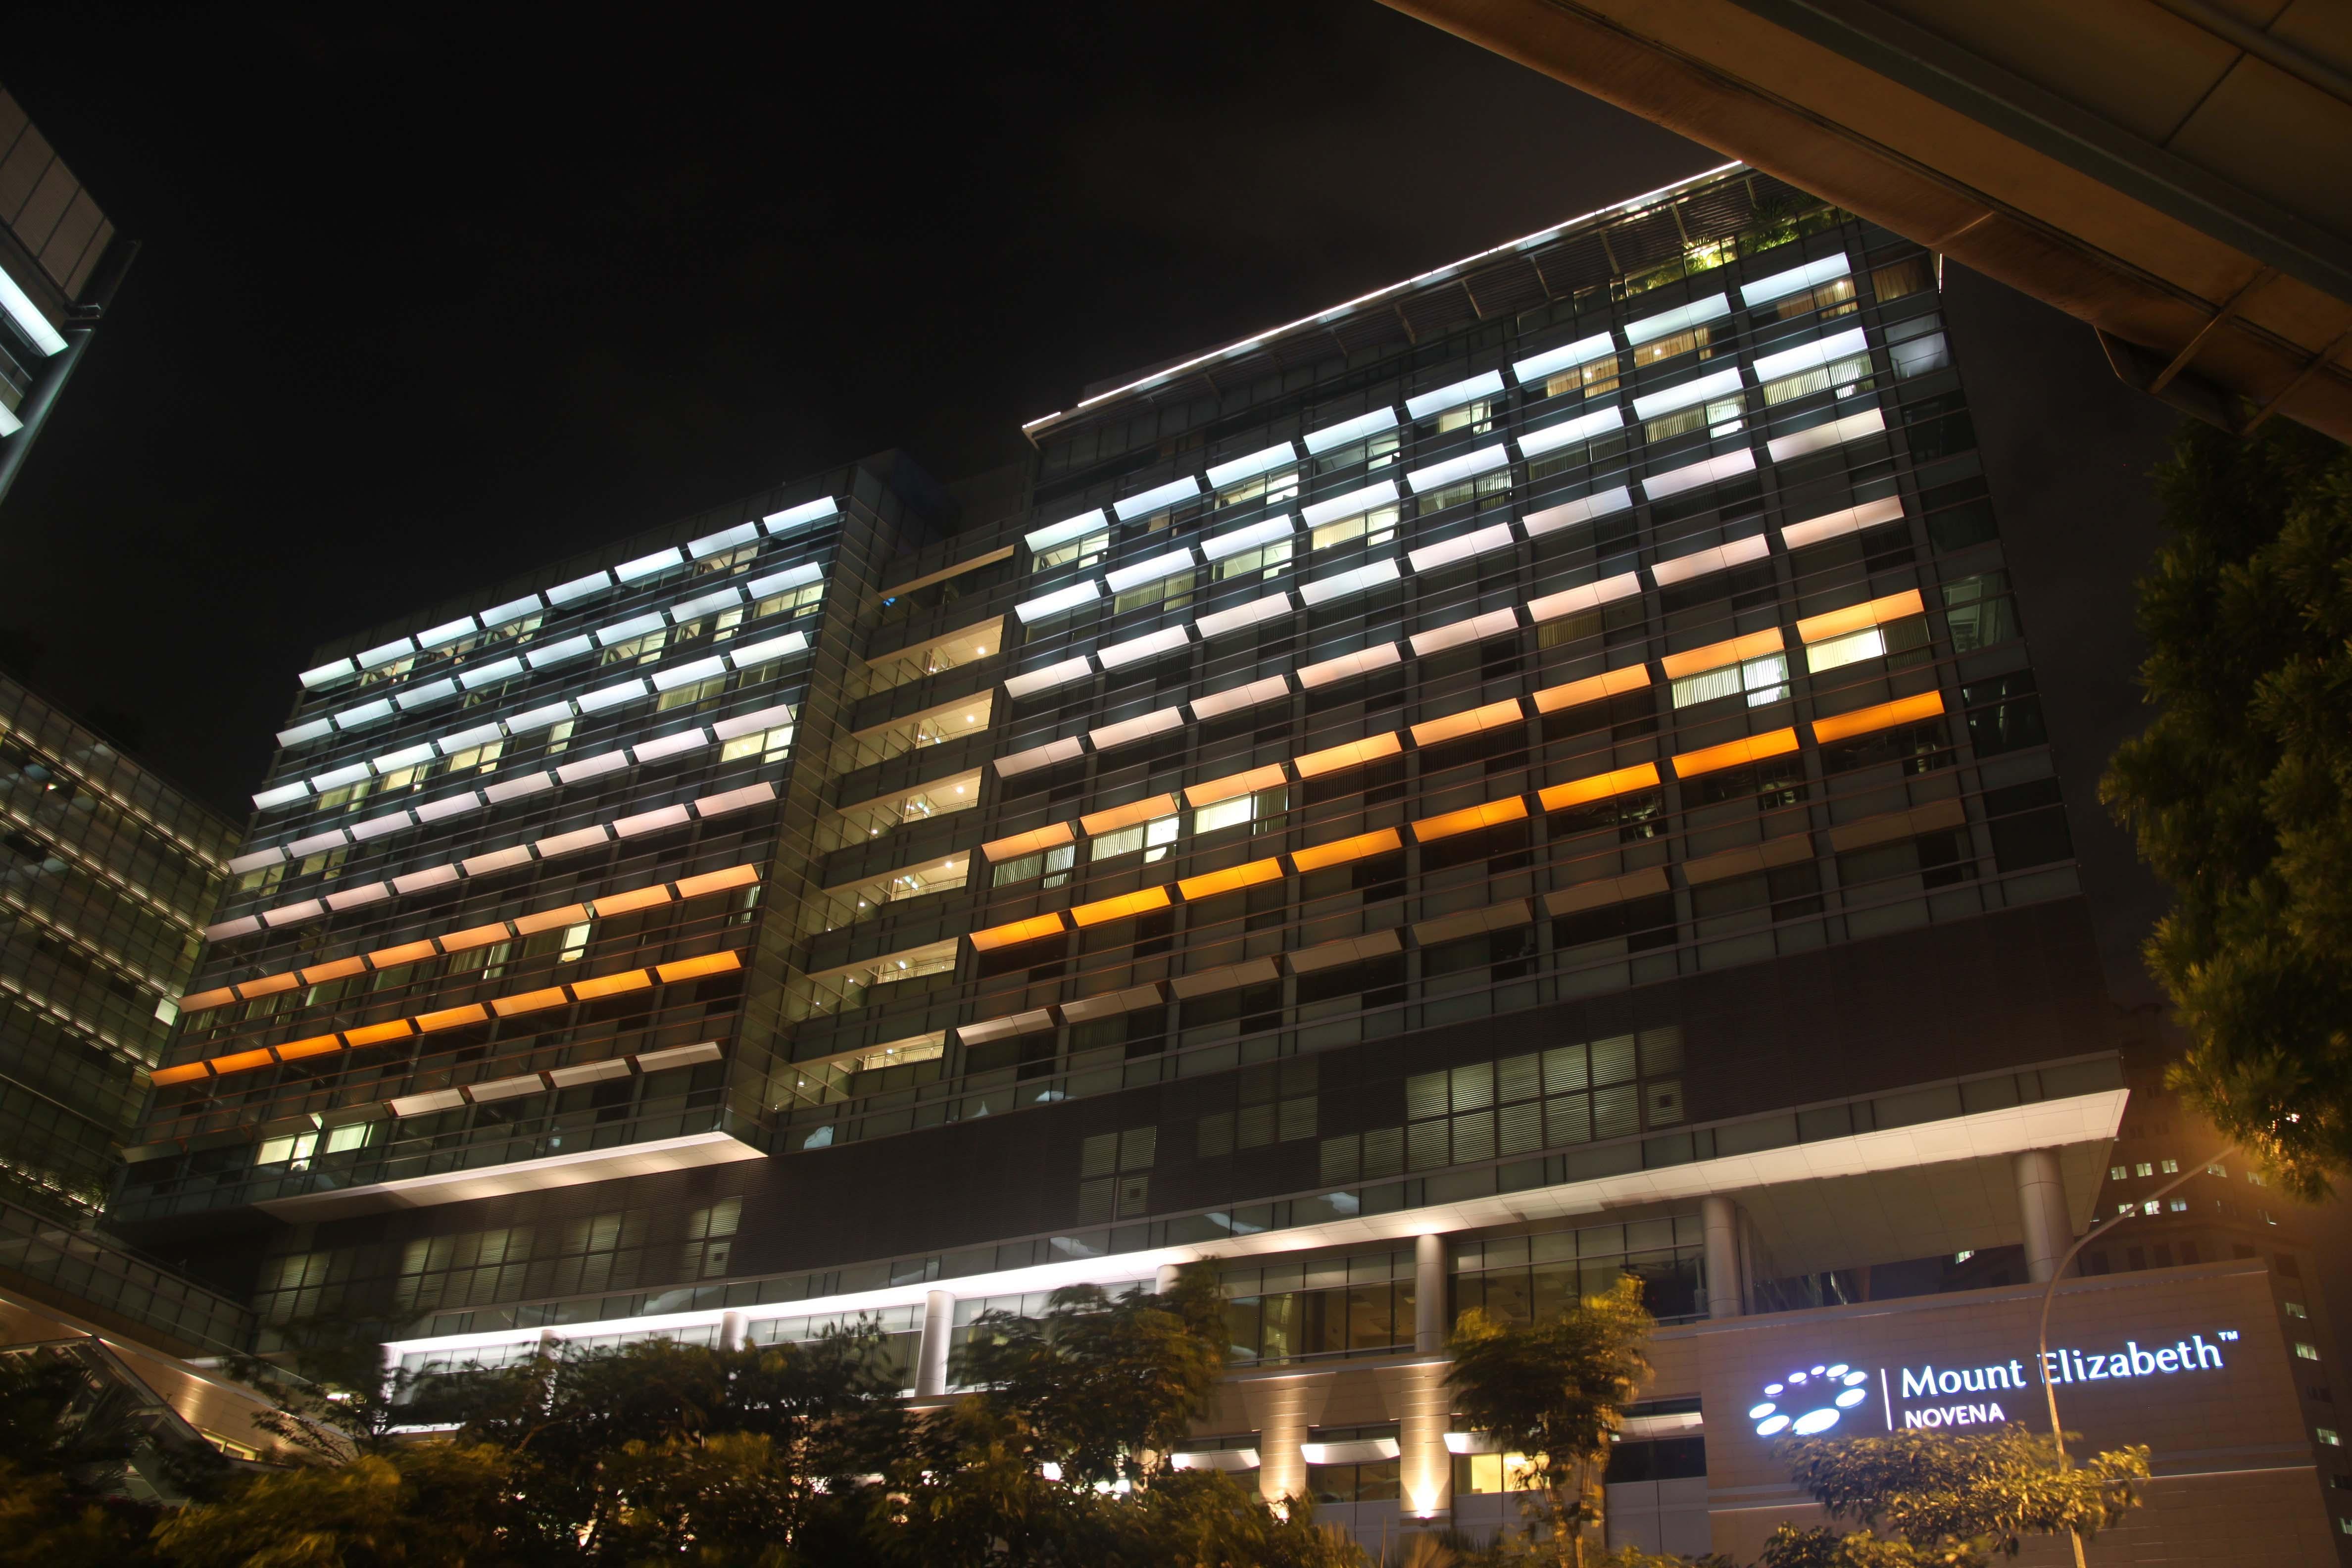 Mount Elizabeth Novena Hospital exterior